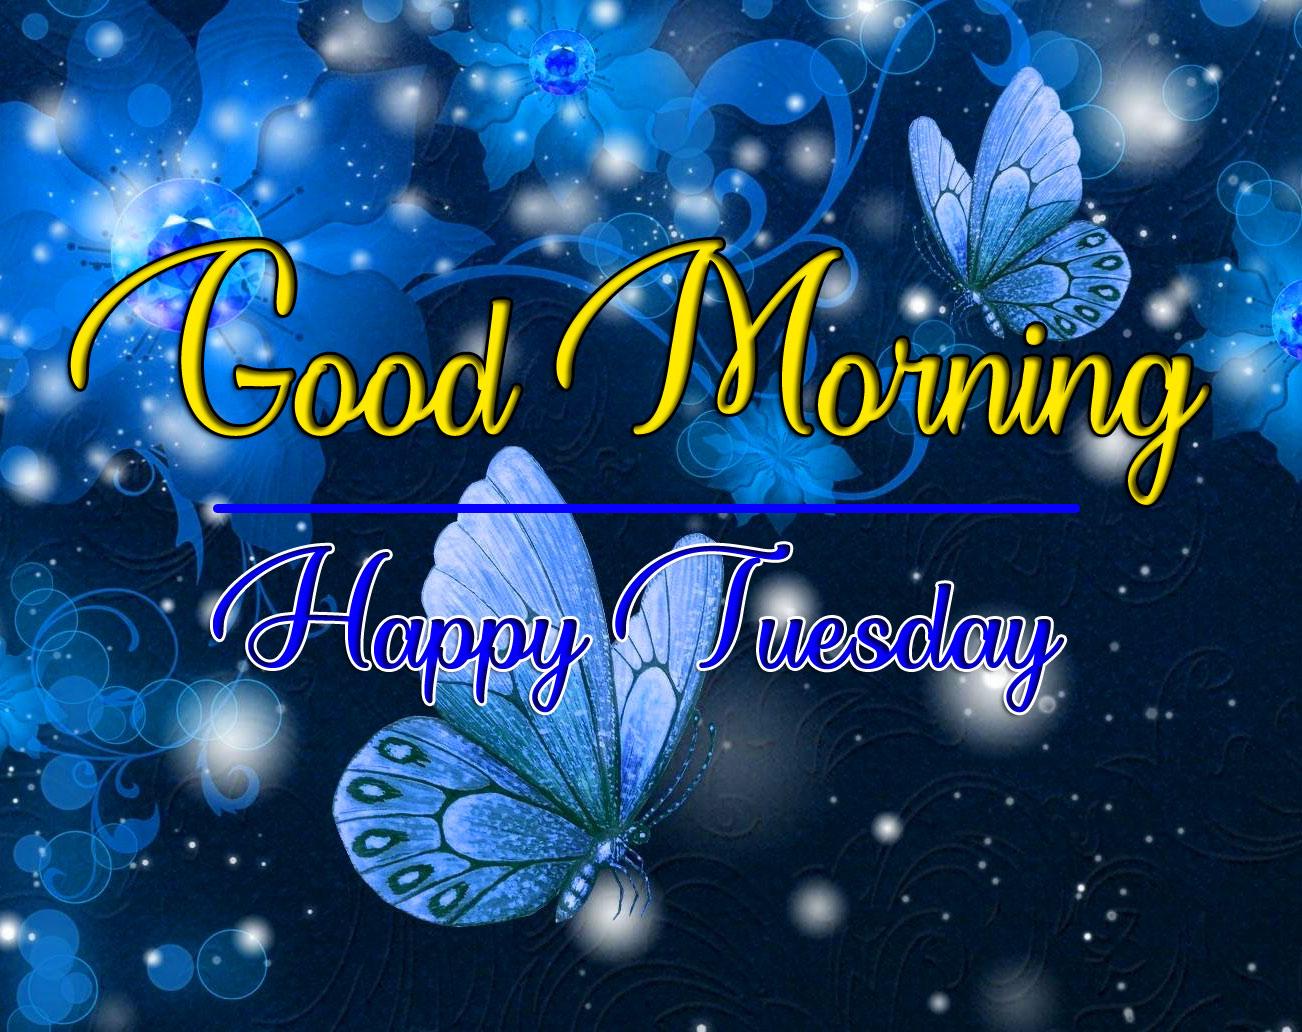 Tuesday Good morning Pics Download 2